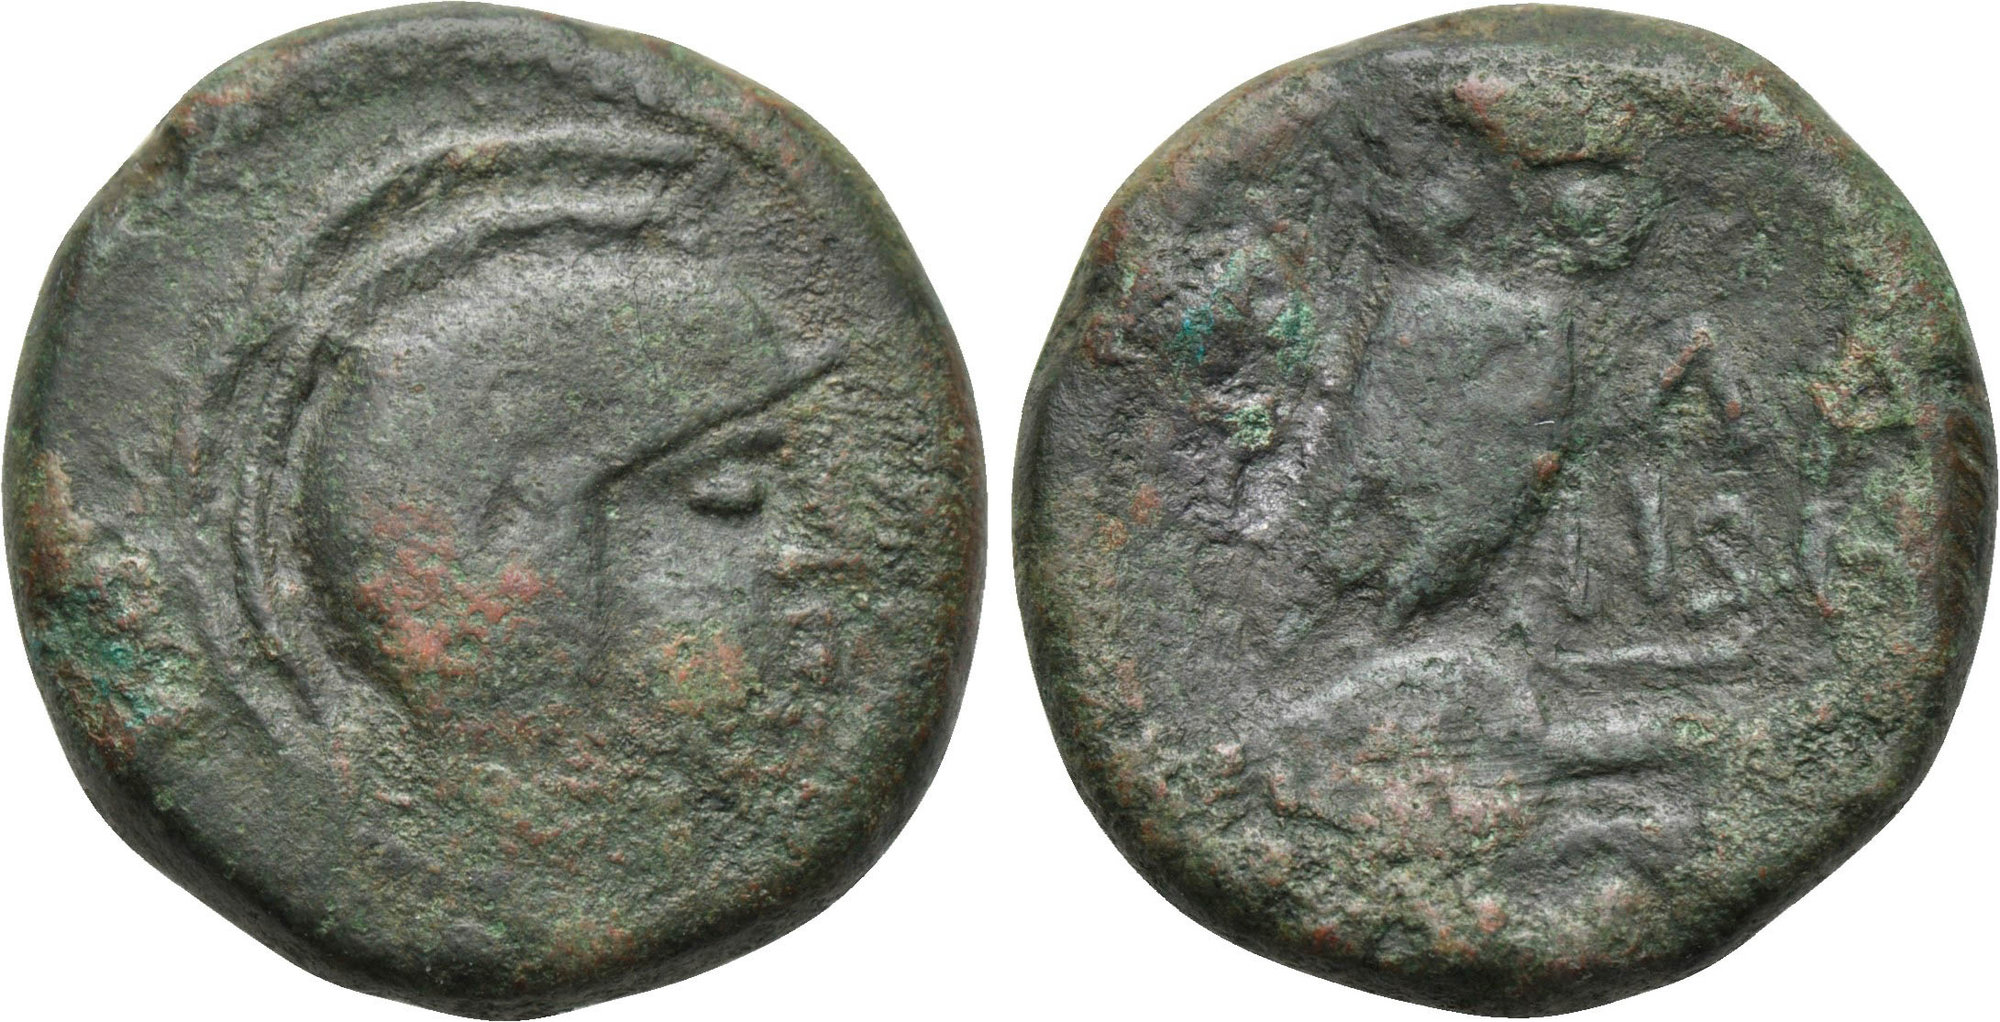 Bronce de Atenas (Atenea - Mochuelo sobre ánfora) / 195-190 a.C. Image00023